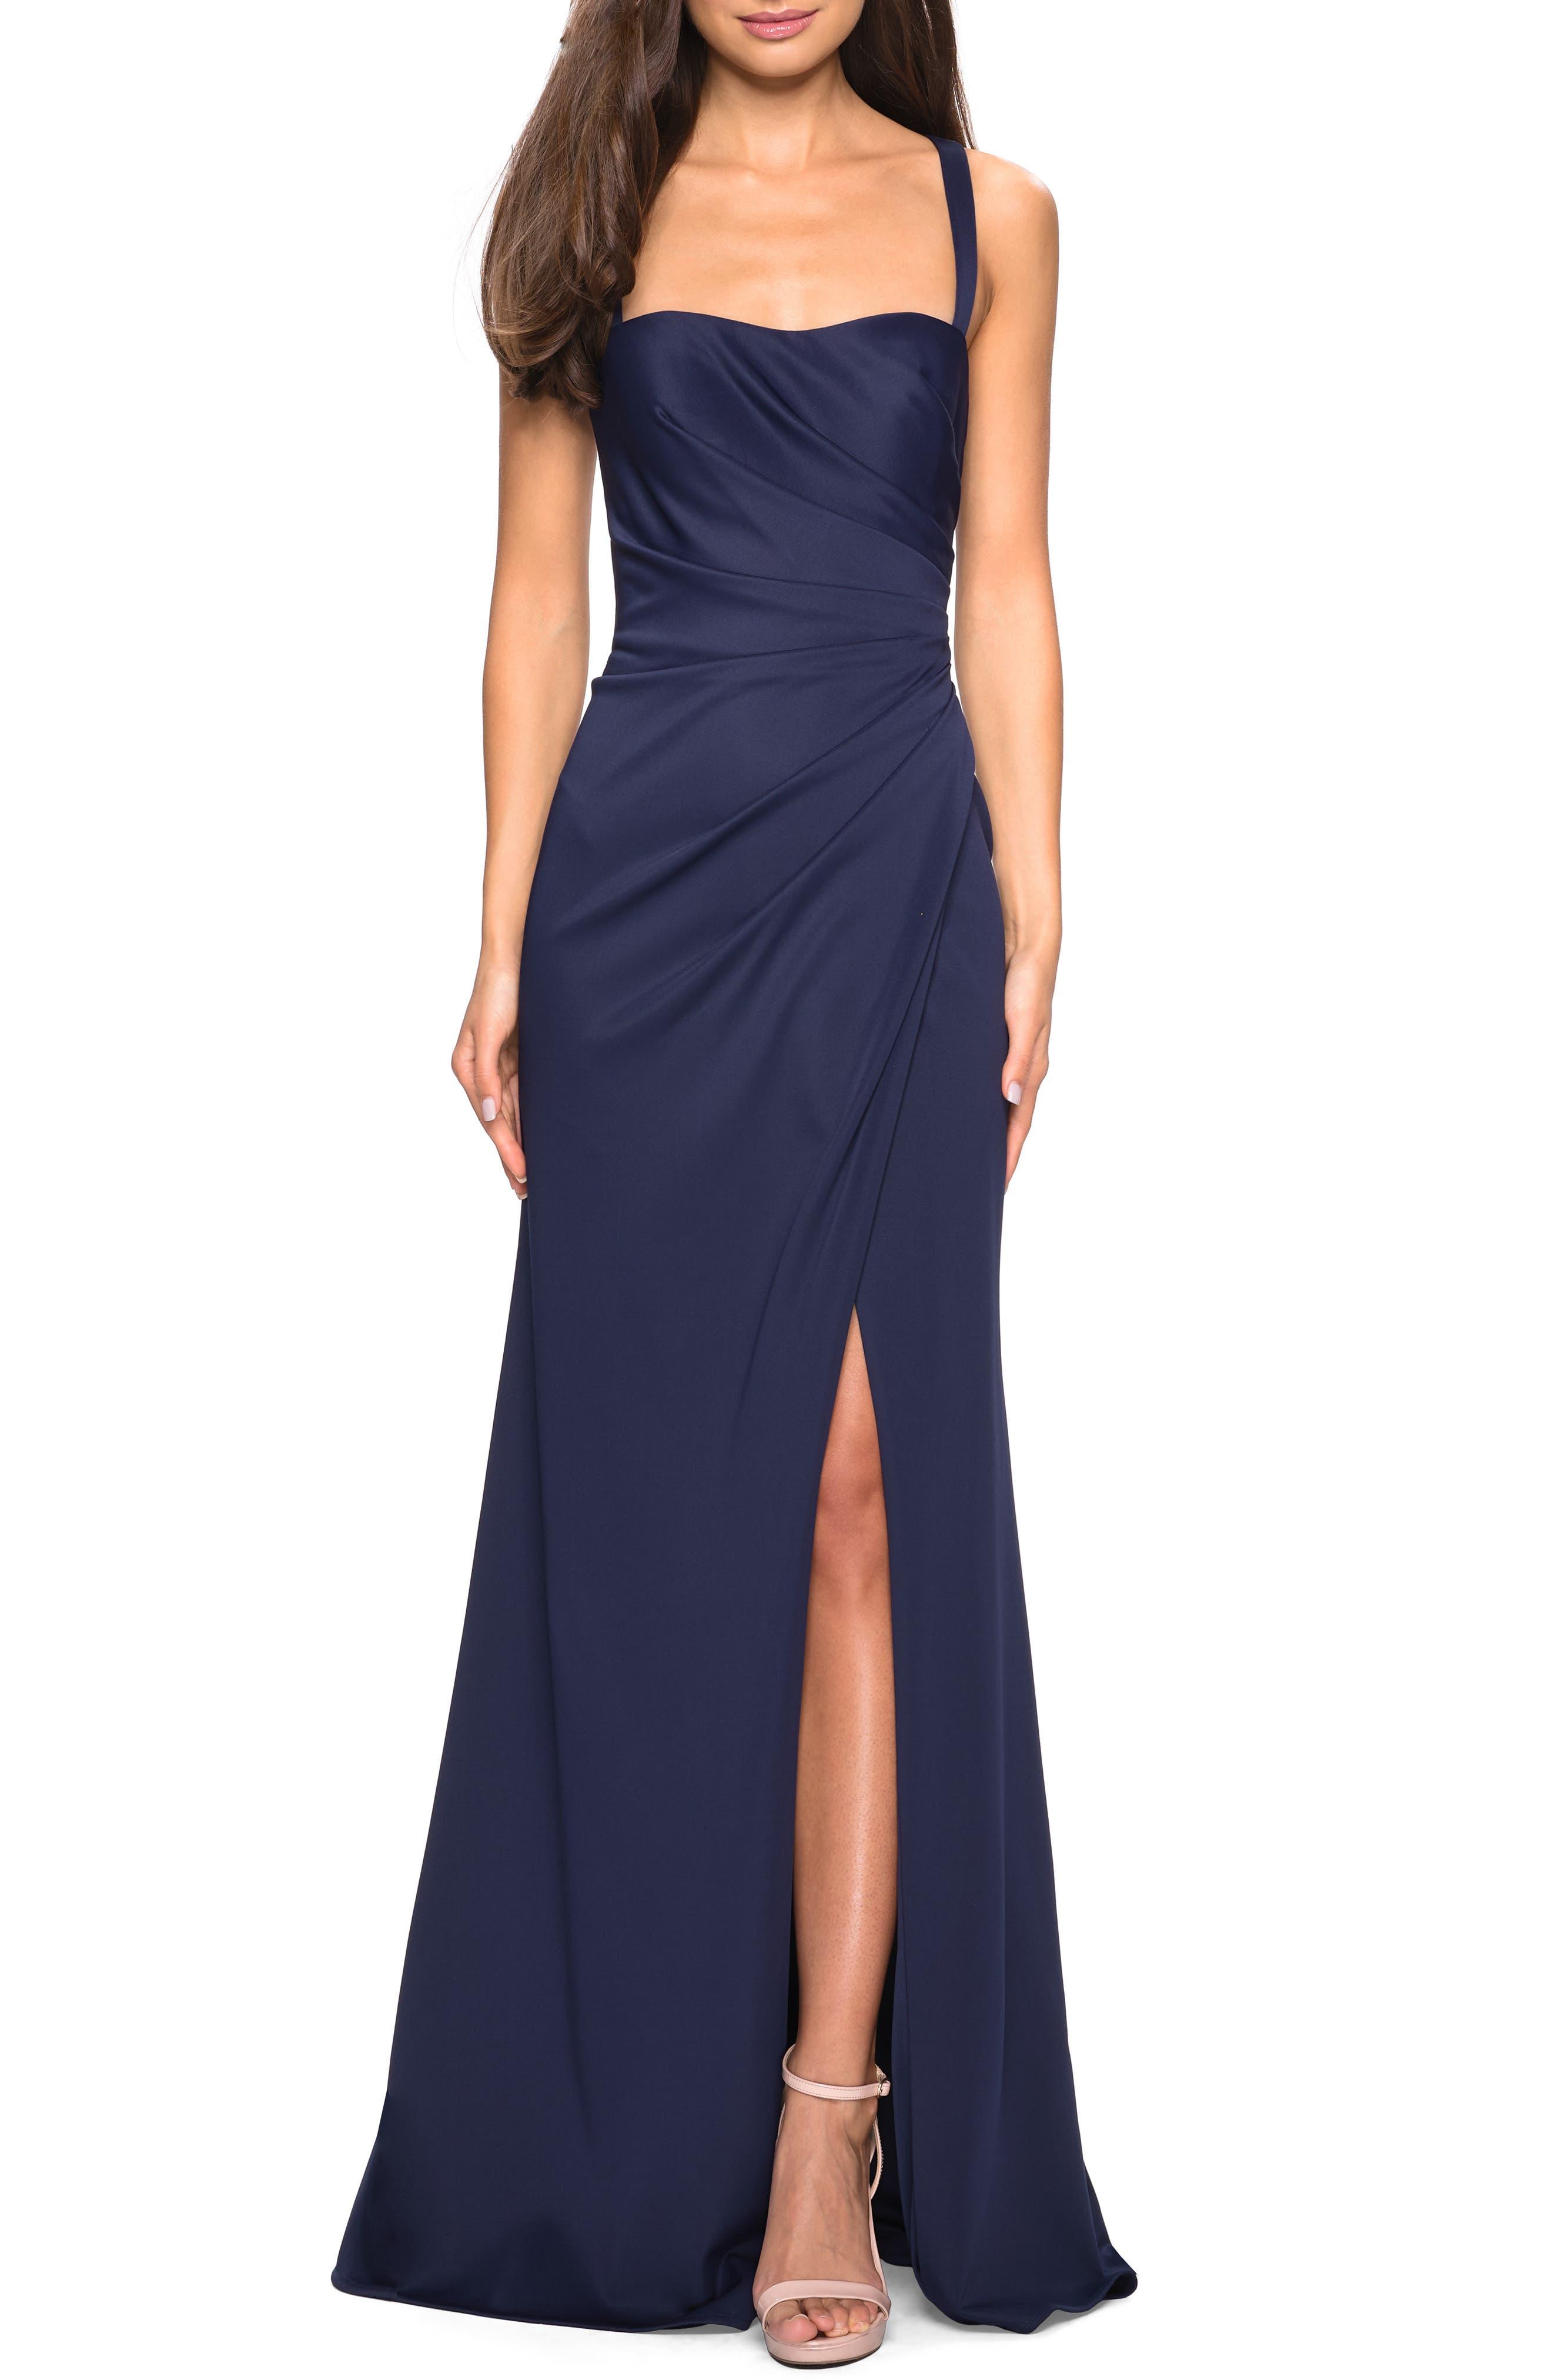 La Femme Ruched Soft Jersey Evening Dress, Blue